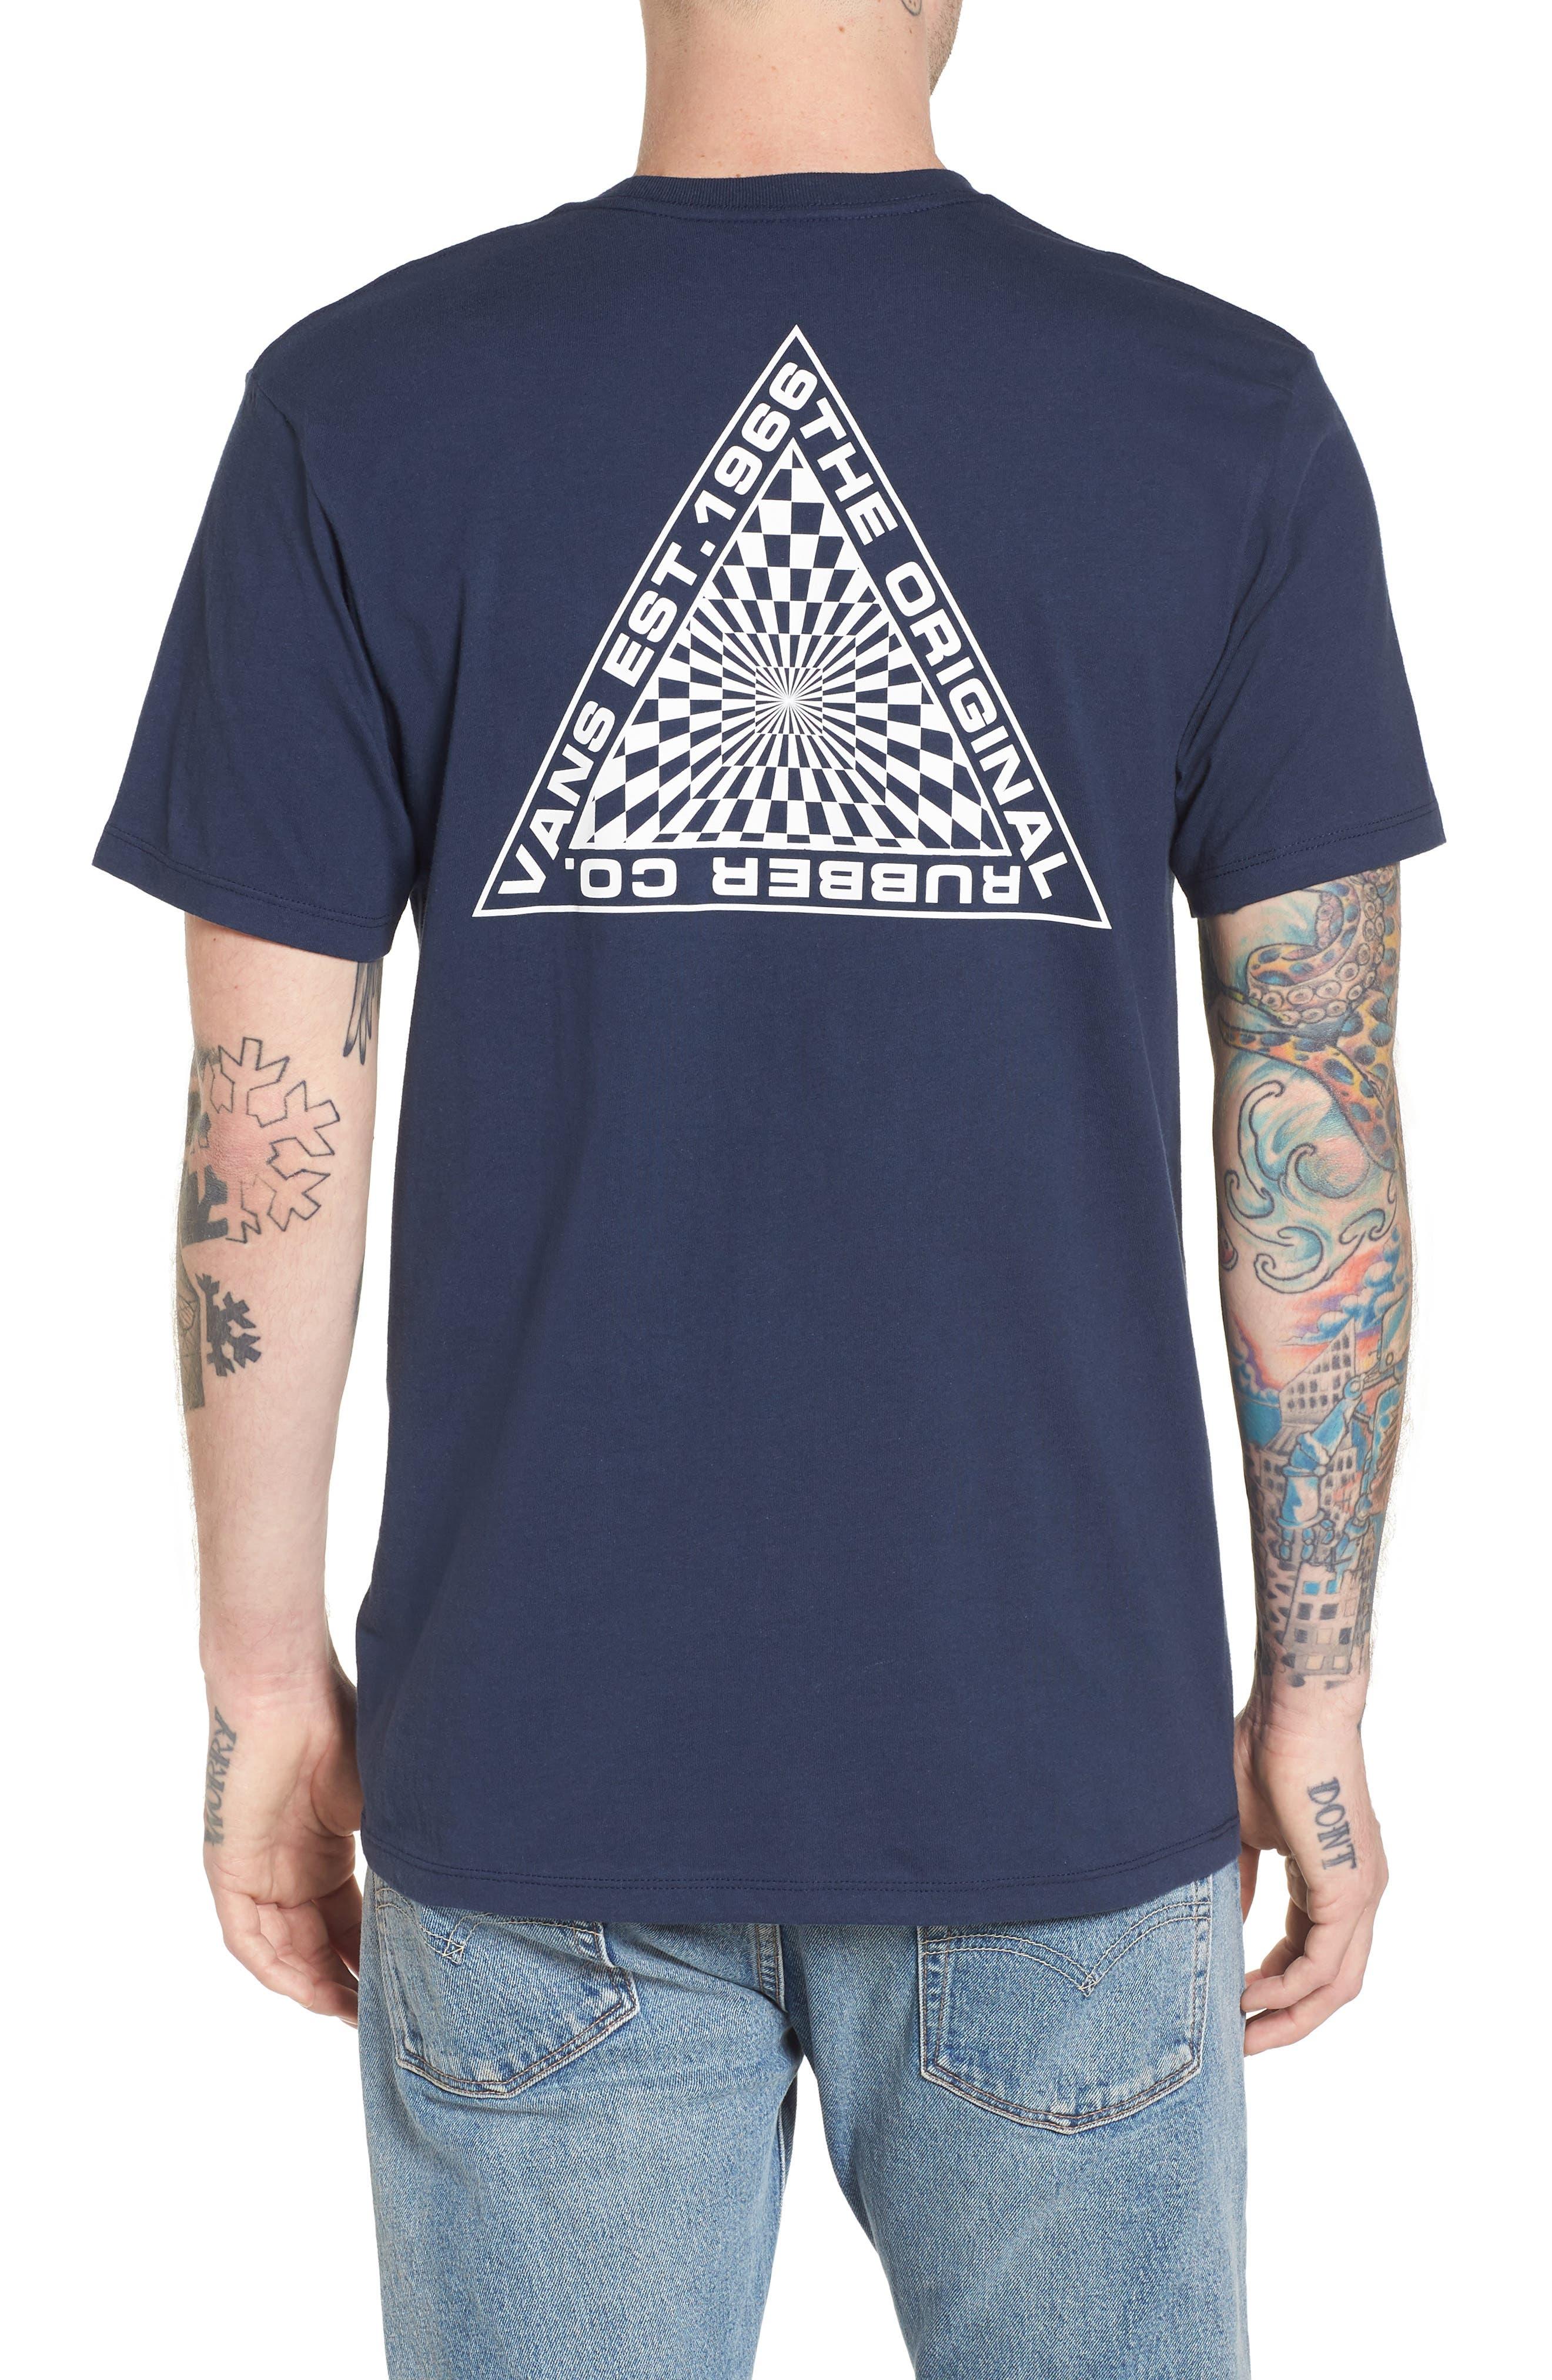 Hypnotics T-Shirt,                             Alternate thumbnail 2, color,                             401